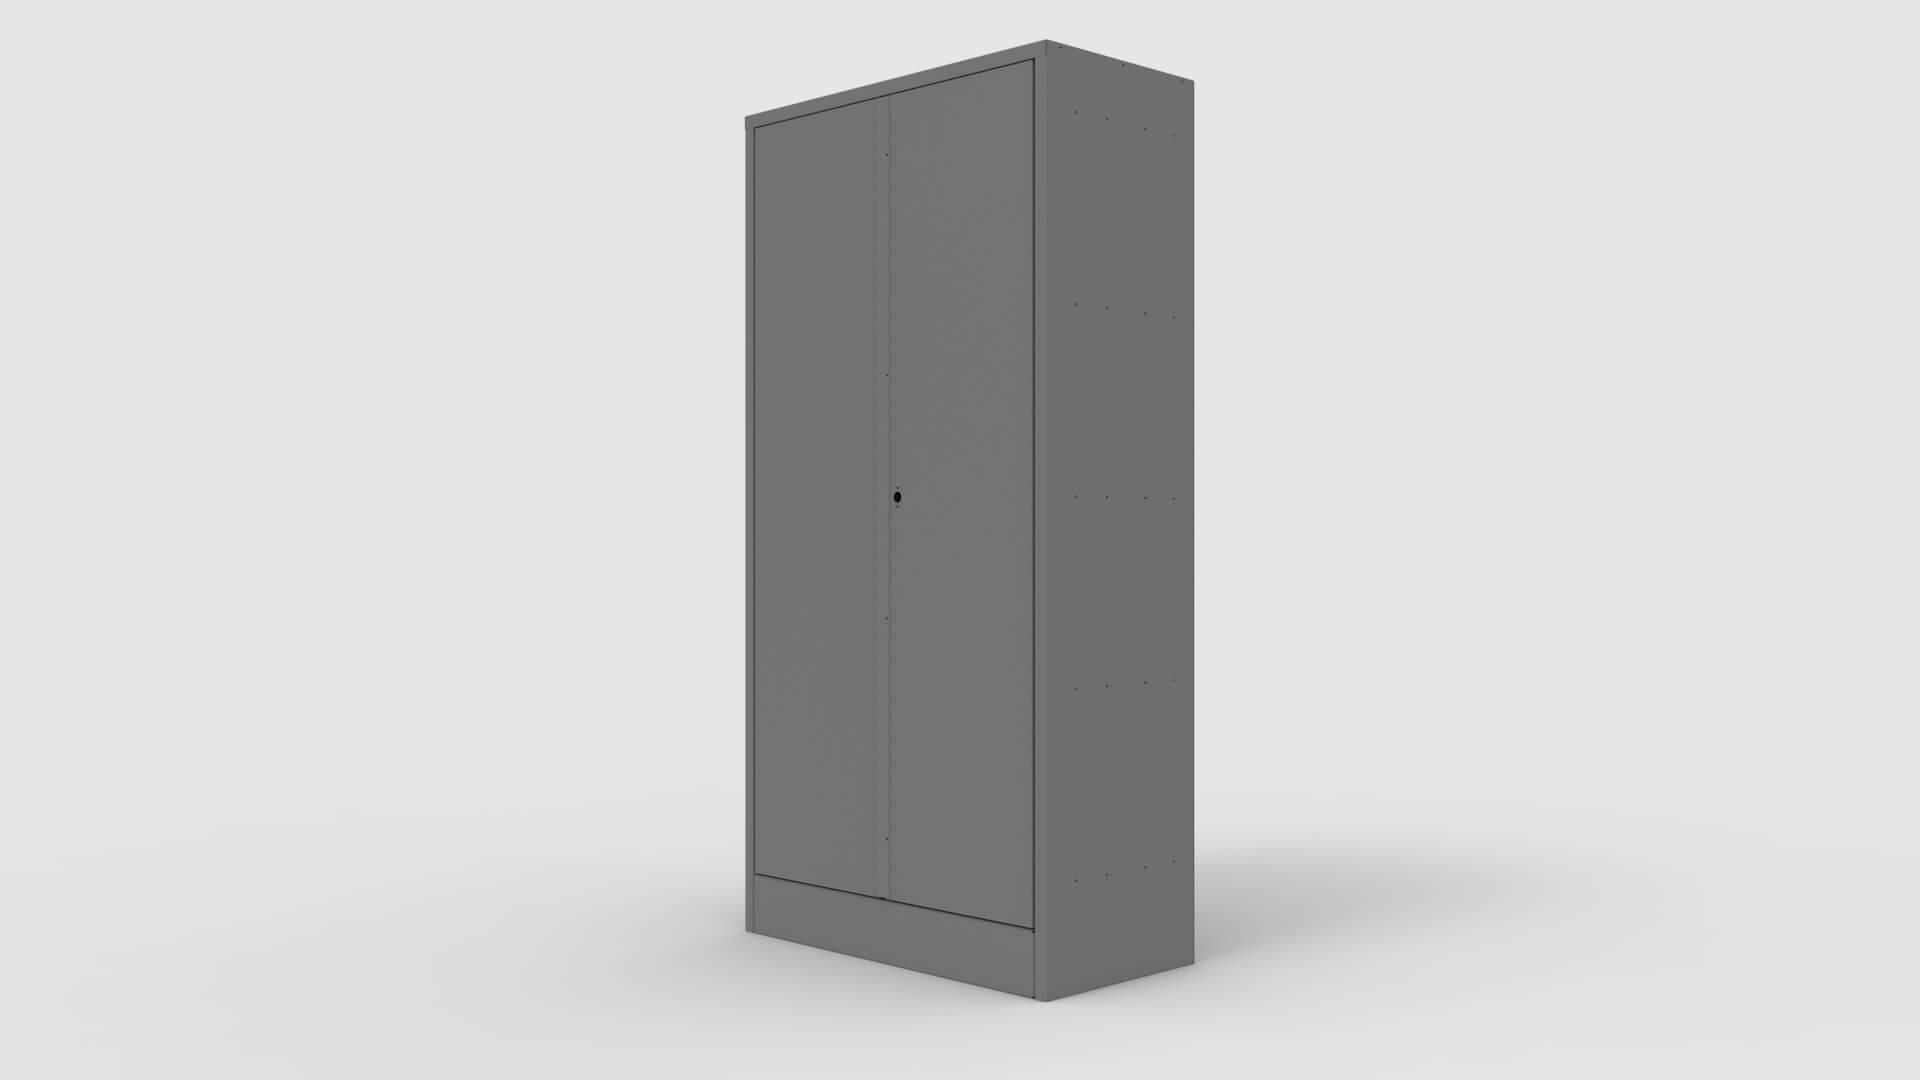 Steel Cupboard Product